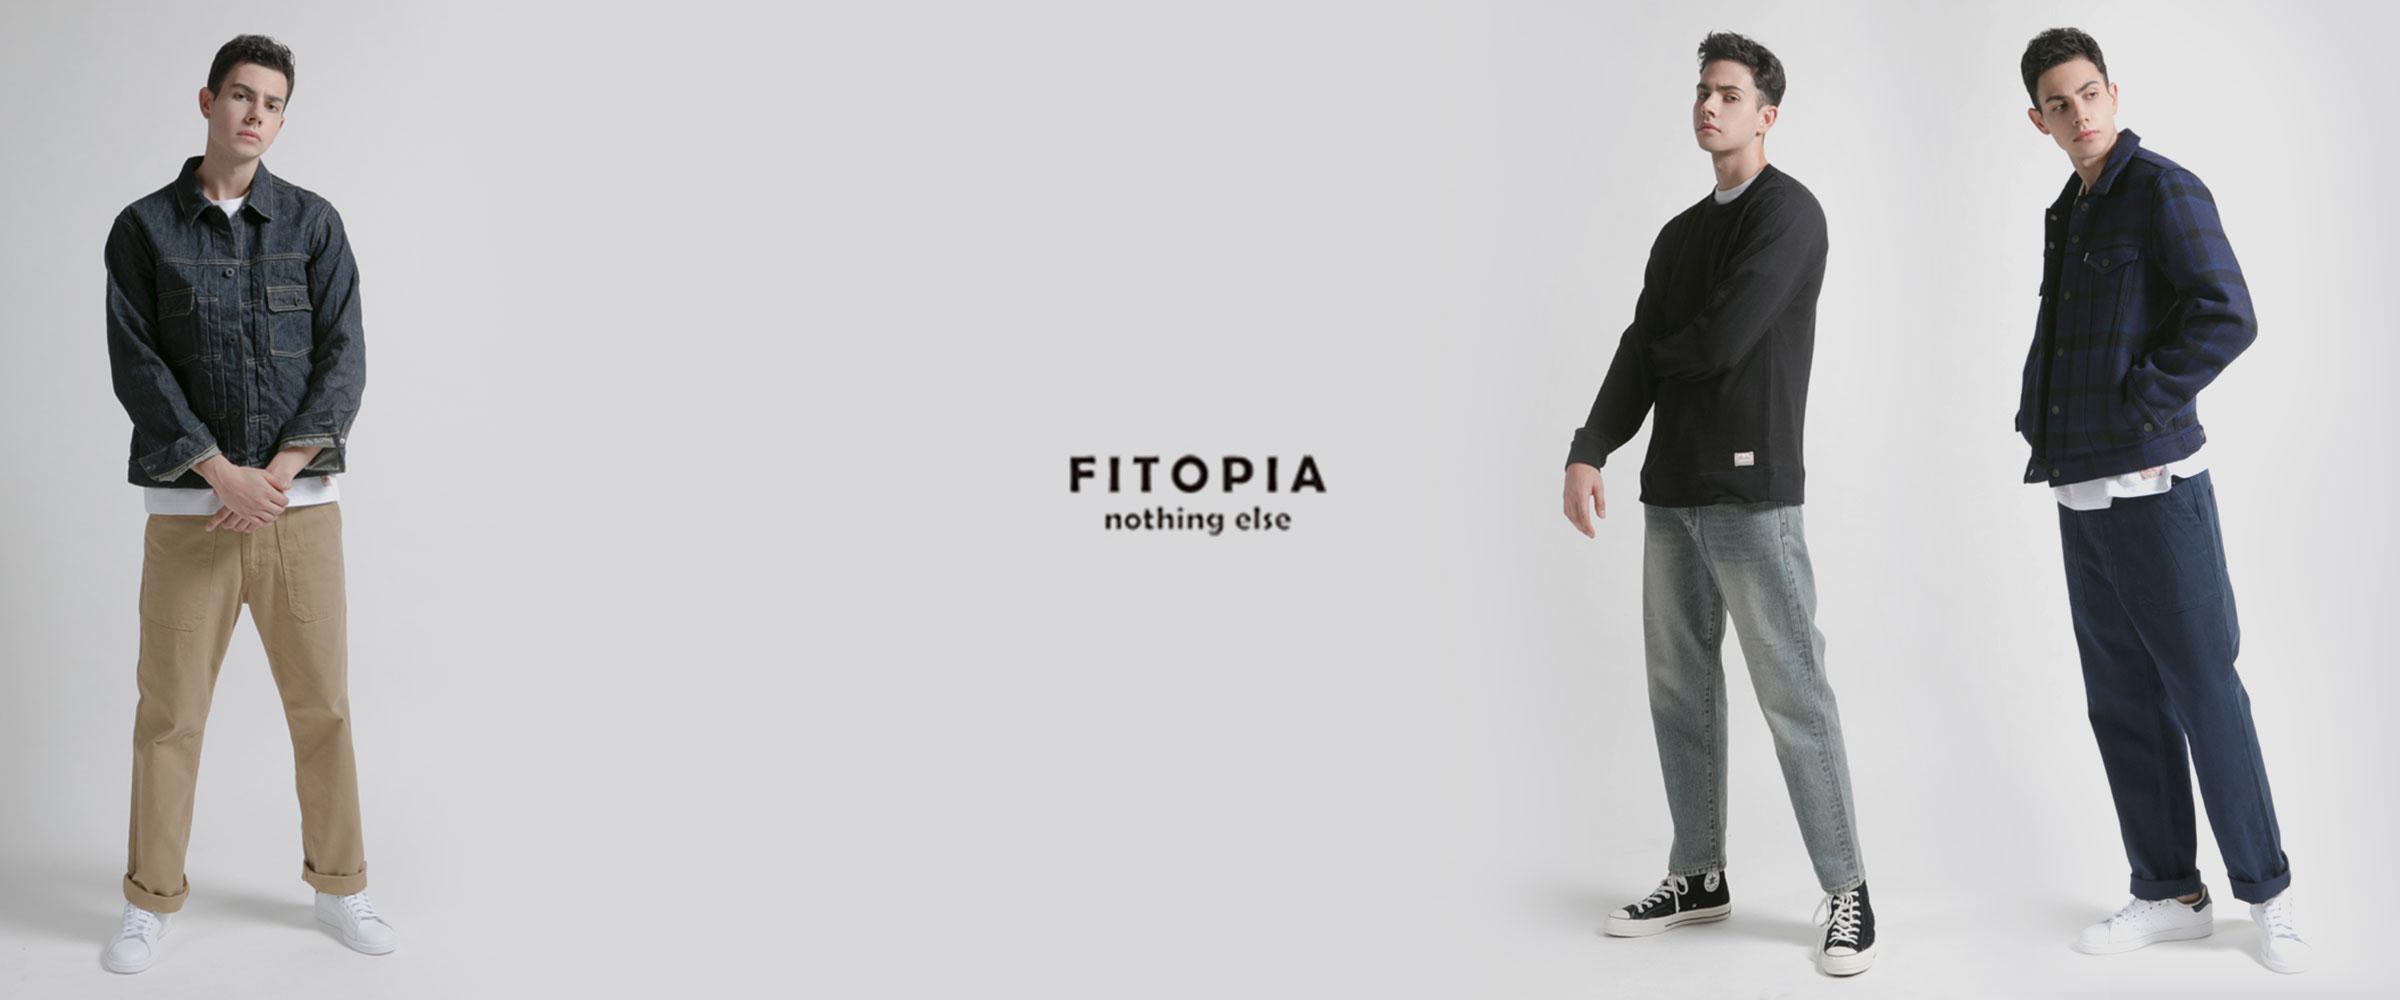 fitopia.jpg